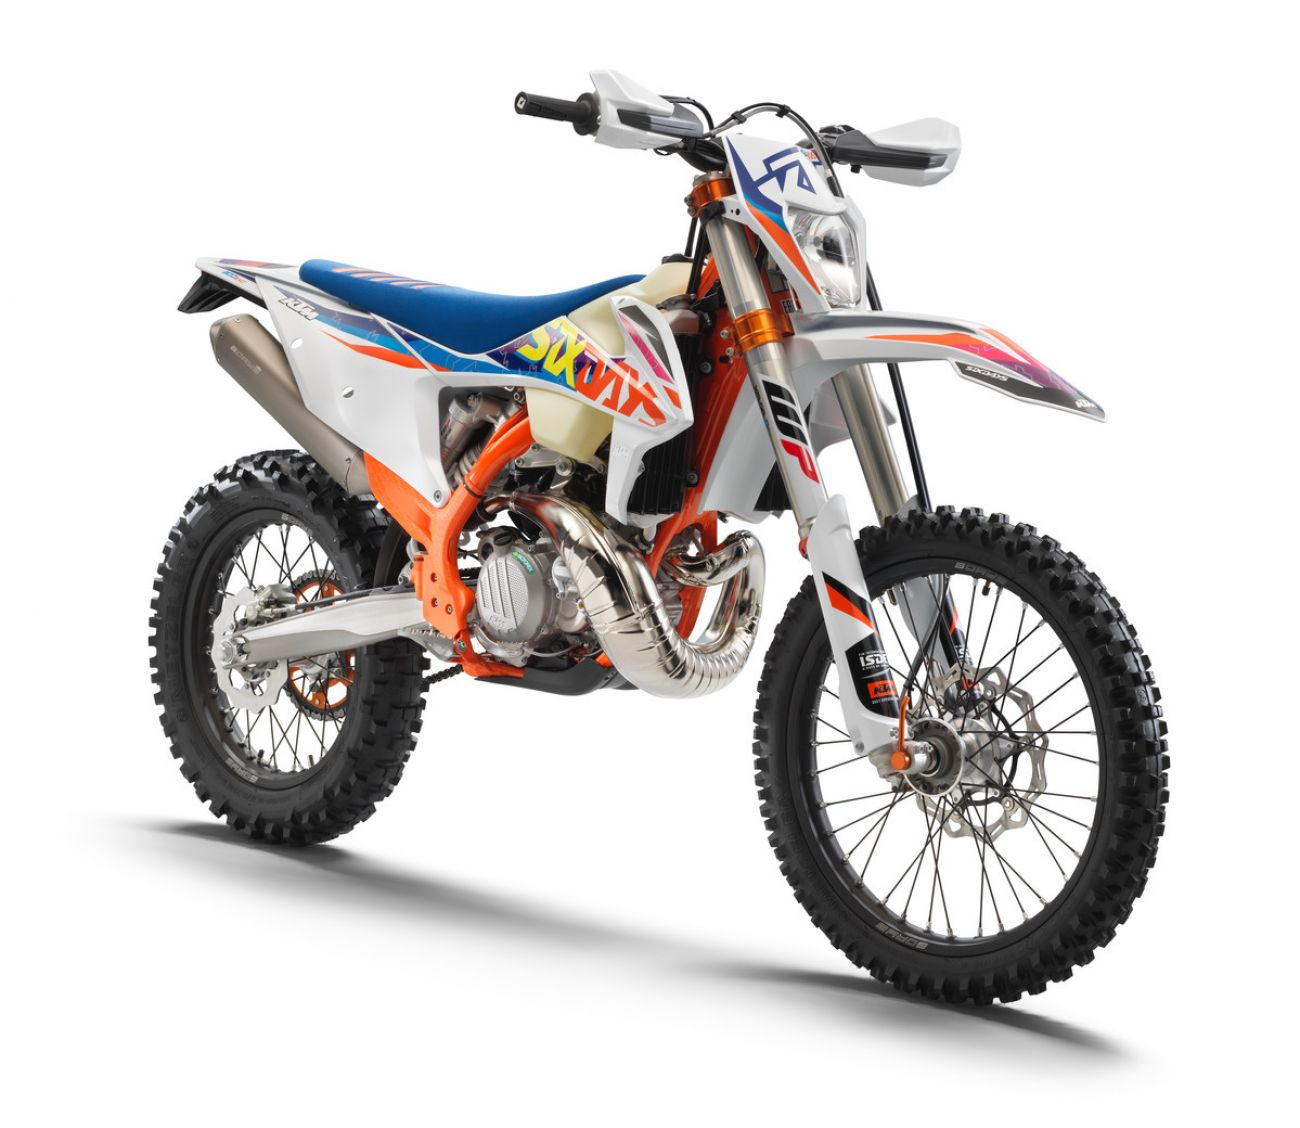 MOTORCYCLES KTM ENDURO MY22 386919_300EXCTPISixDays_front_ri_MY22